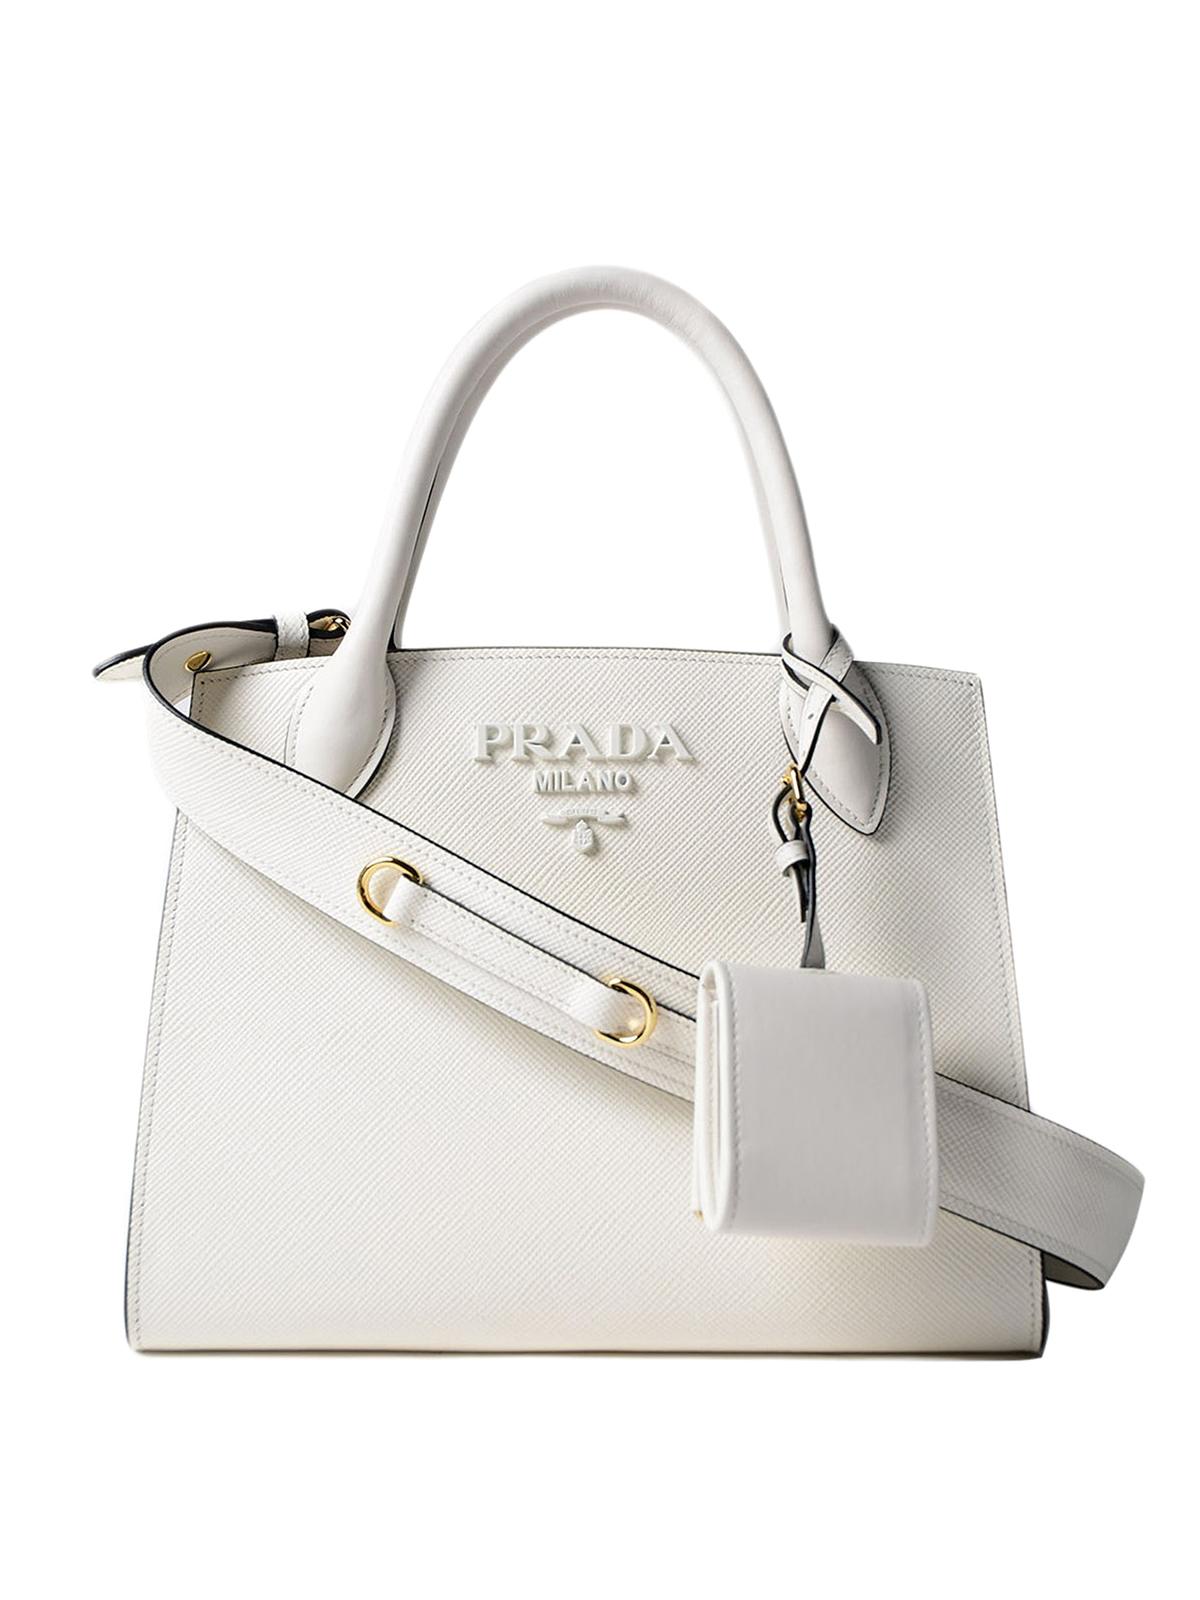 38945b5193c4 Prada - Monochrome saffiano leather tote - totes bags - 1BA1562ERX009